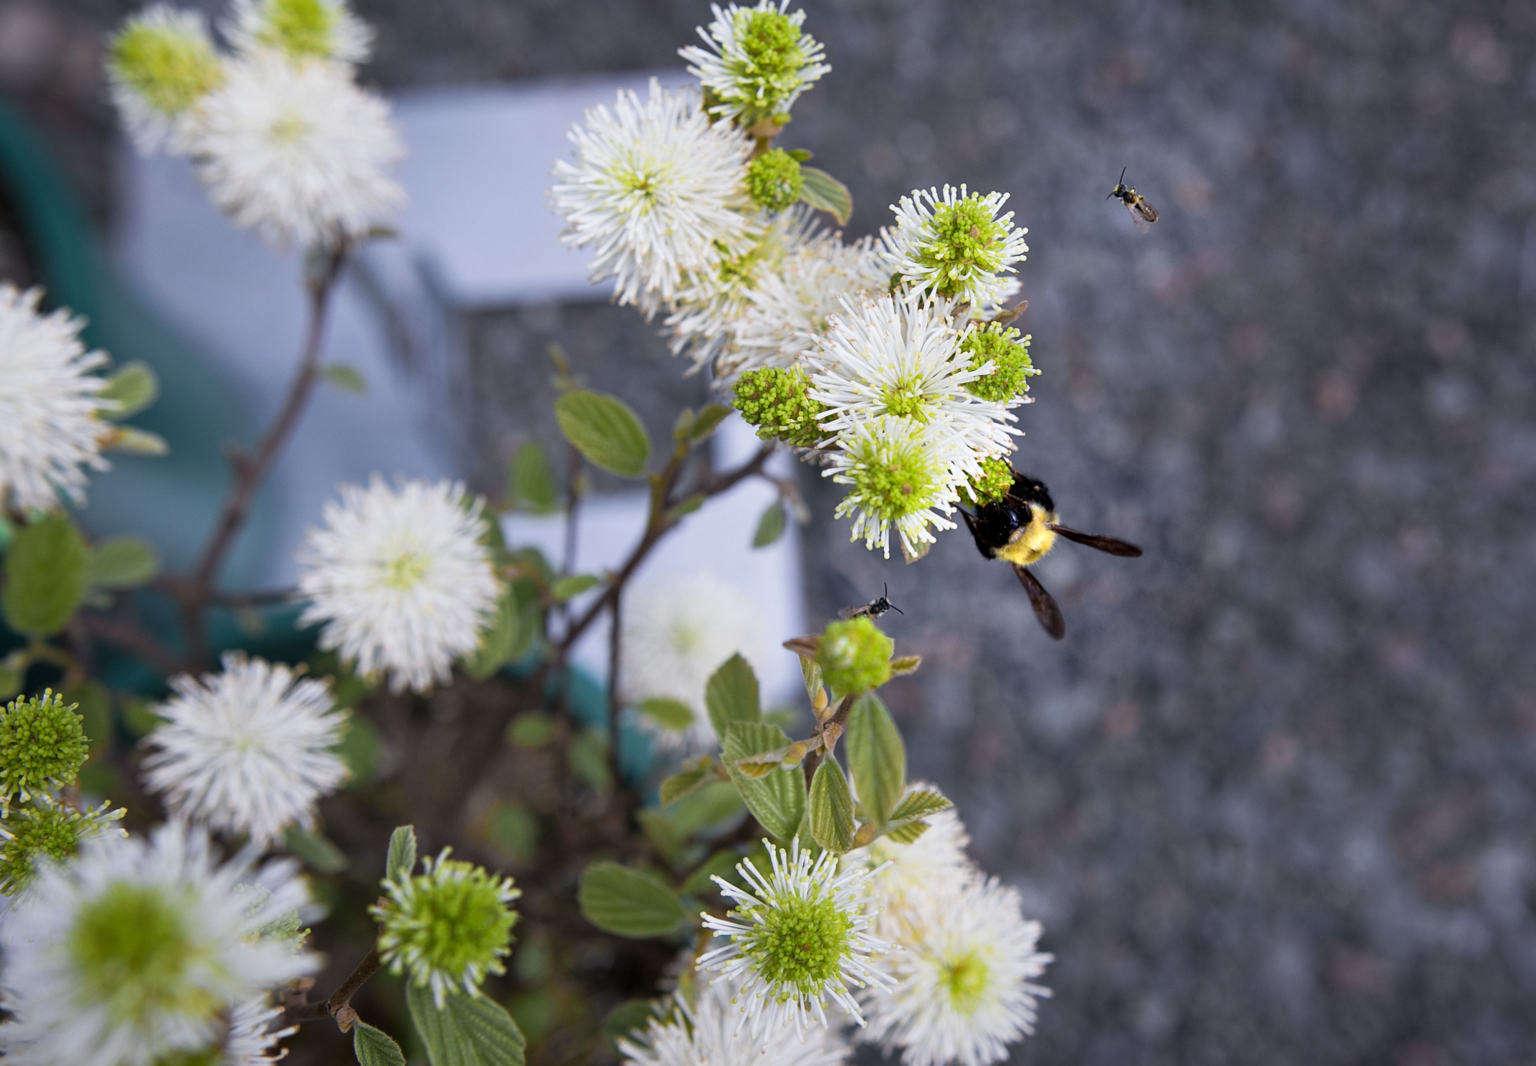 Pollinator Gardens: 8 Easy Steps to Design a Landscape with ... on native perennial garden, native wildflower garden, native plant garden, native bee habitat,